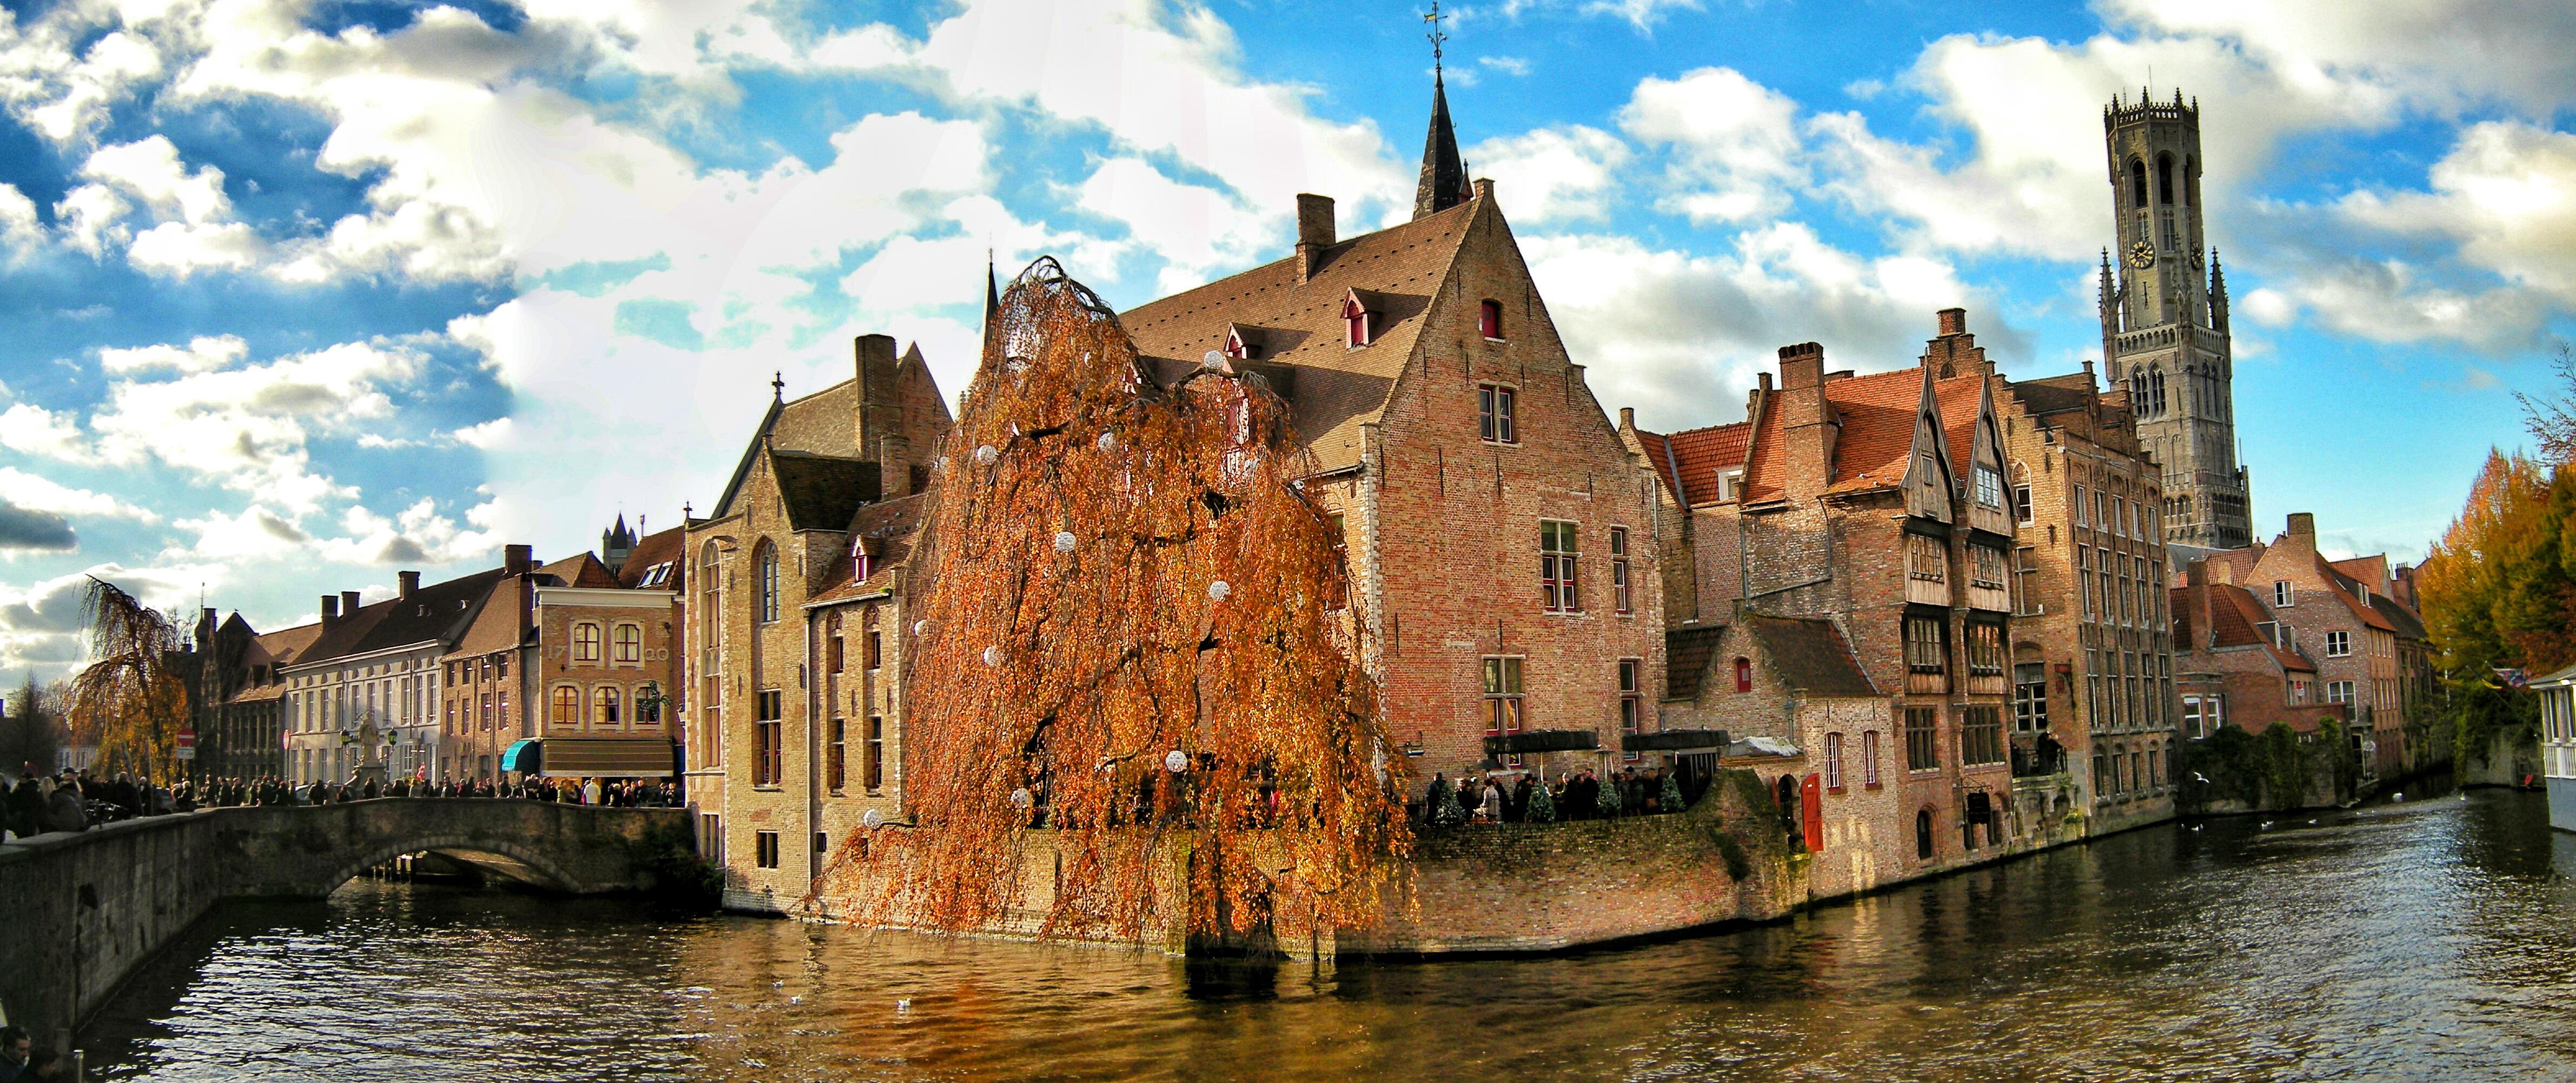 Bruges-Brugge-Rozenhoedkaai[1]